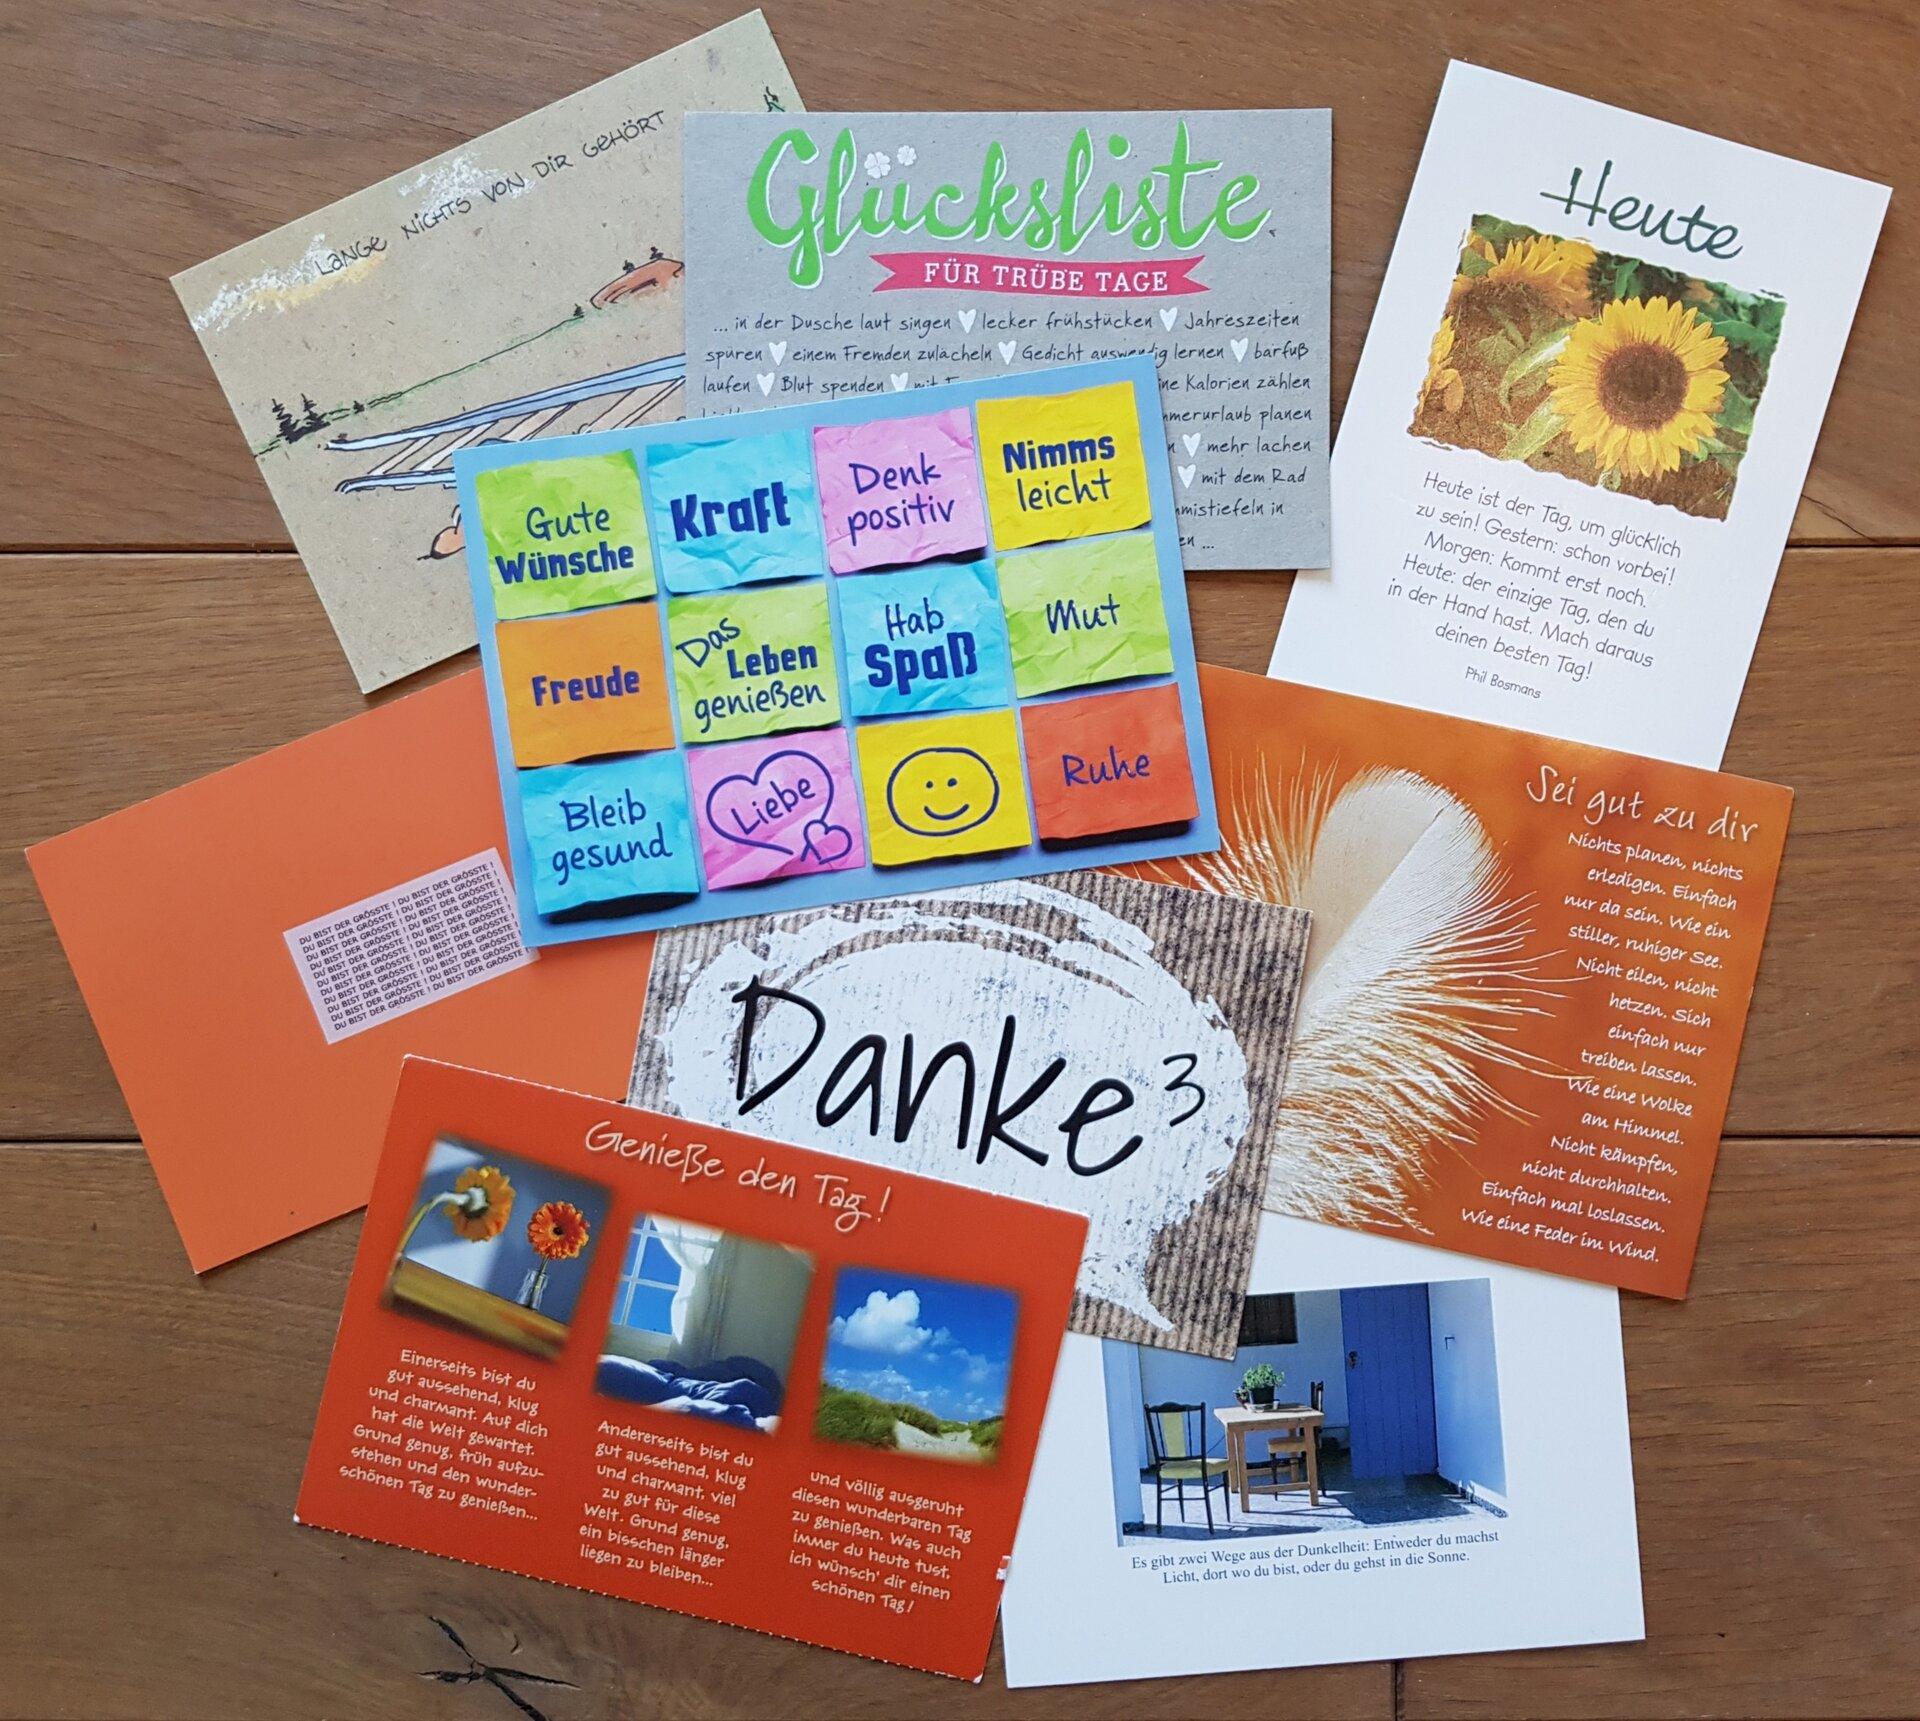 Bild zeigt verschiedene Postkarten